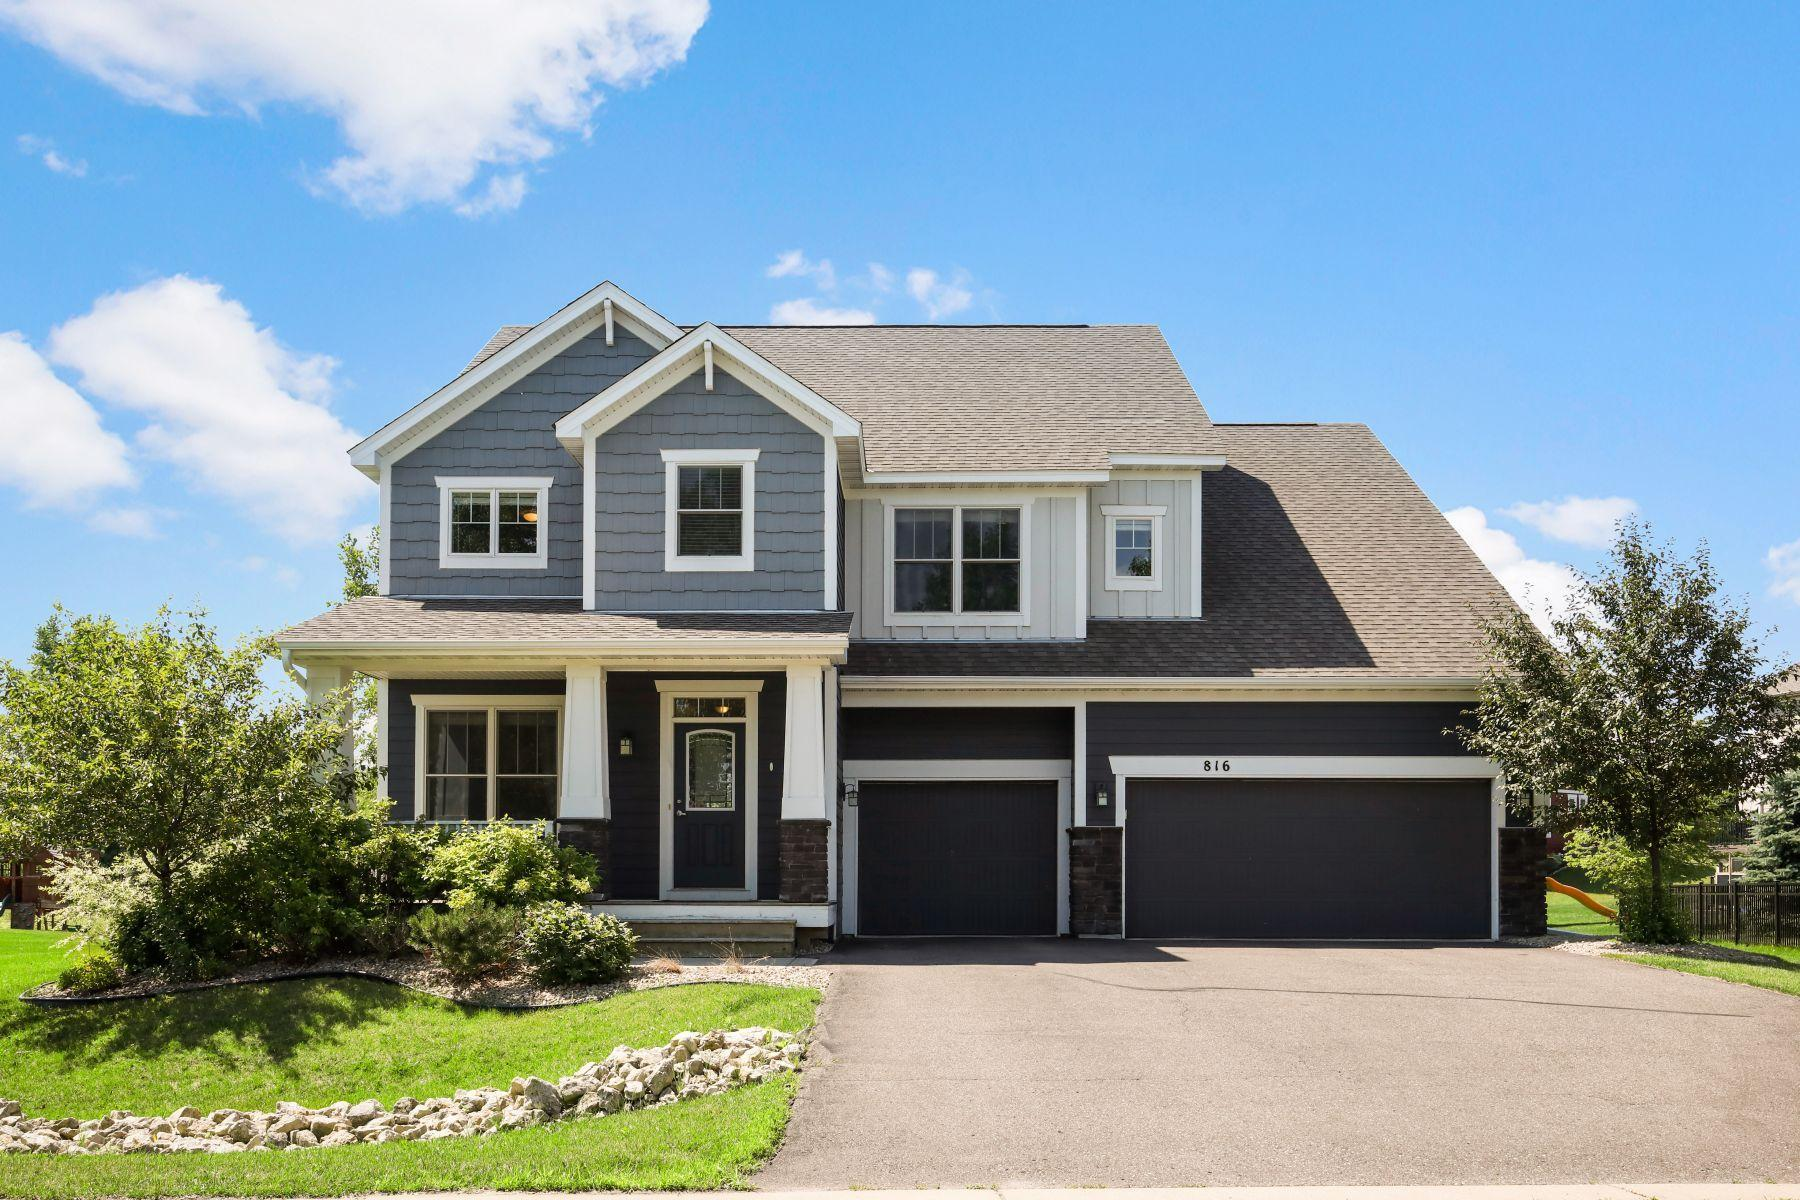 816 Inspiration S Property Photo - Bayport, MN real estate listing